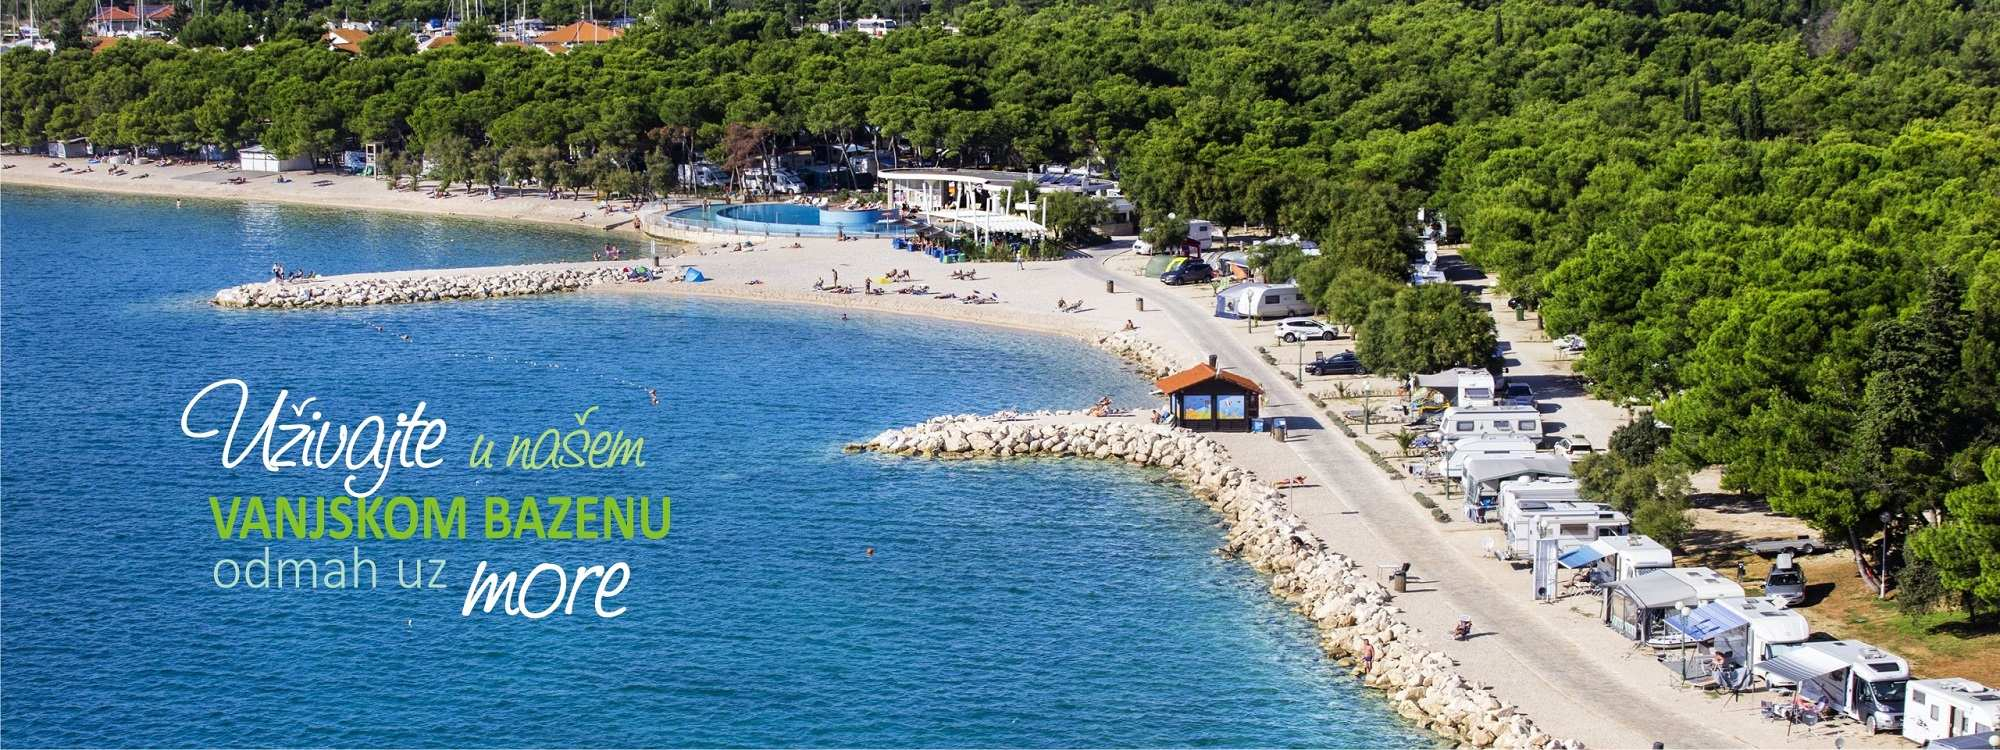 Solaris_camping_beach_resort_hrvatska_vanjski_bazen_uz_more_ponuda